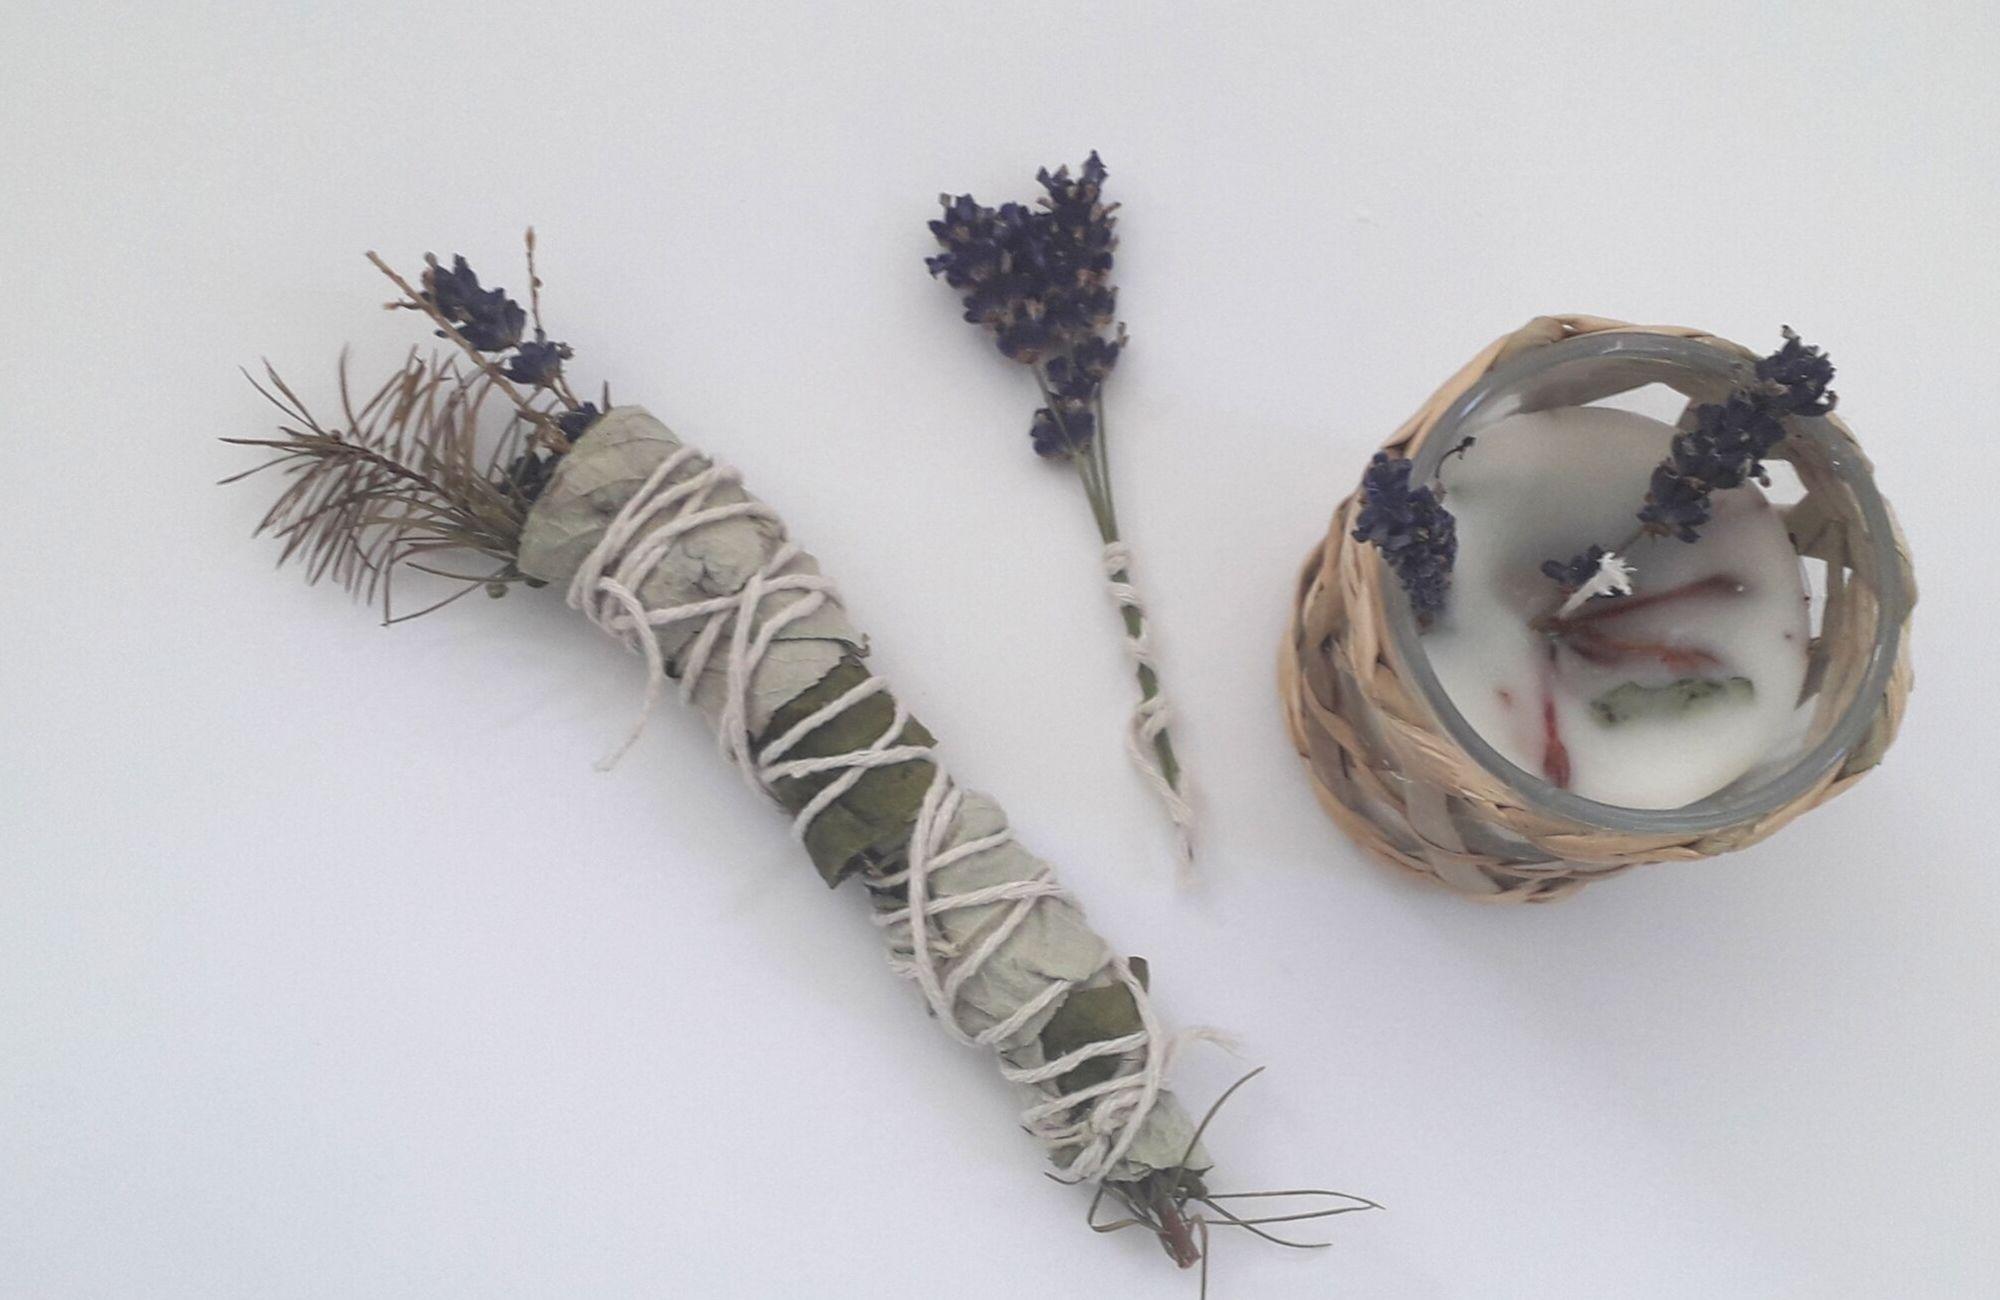 virgo-gift-set-lavender-orchards-near-me